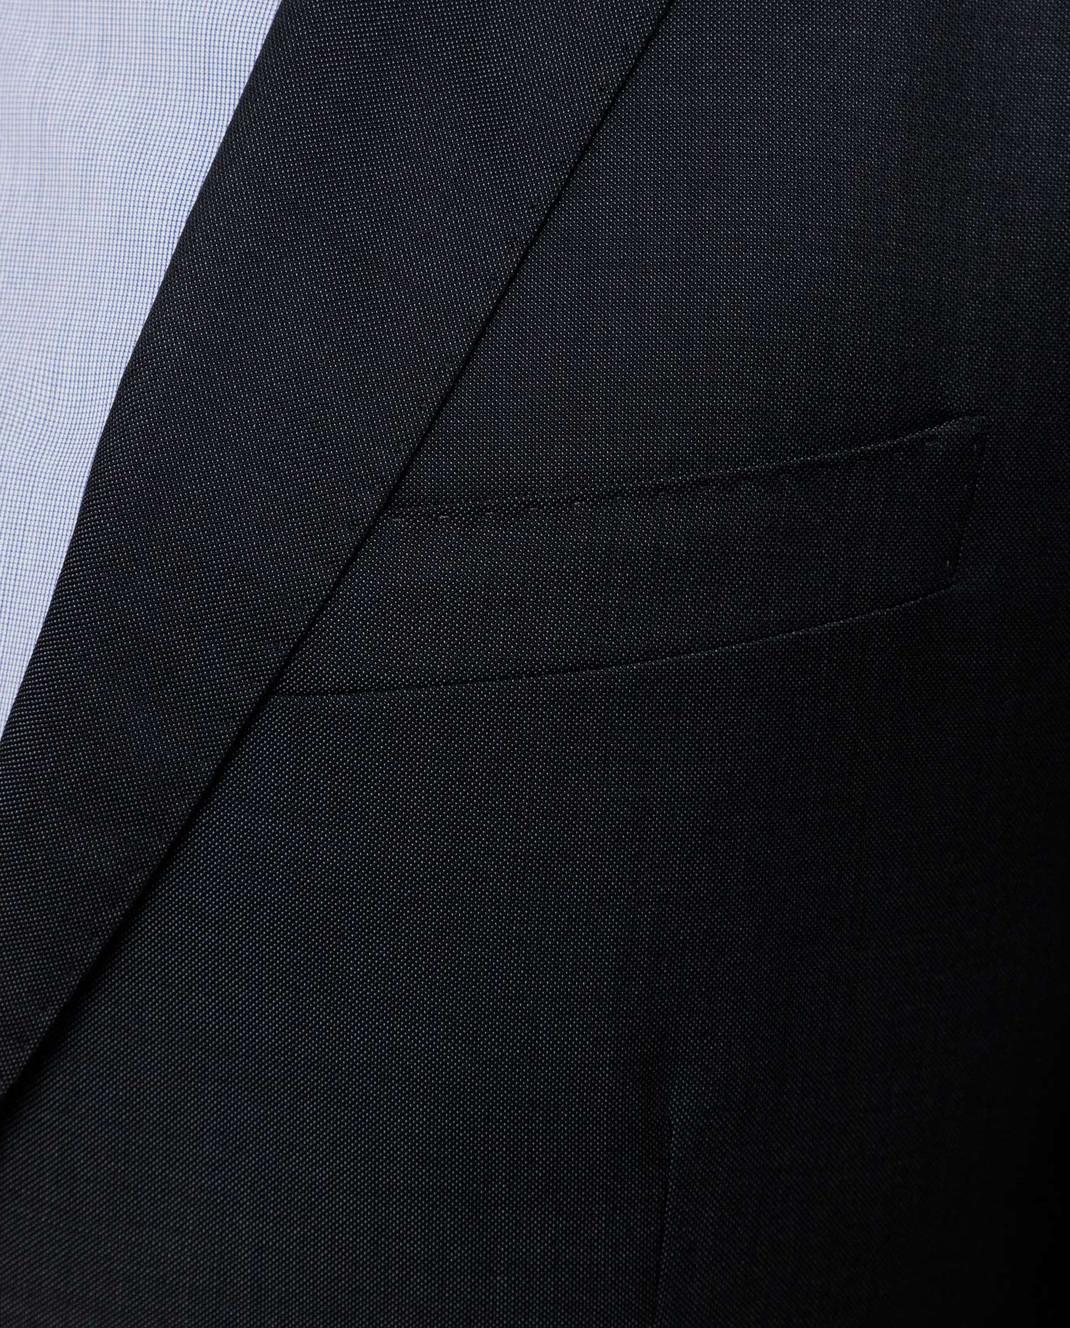 Fradi Тёмно-синий костюм 192AJ7025944 изображение 5